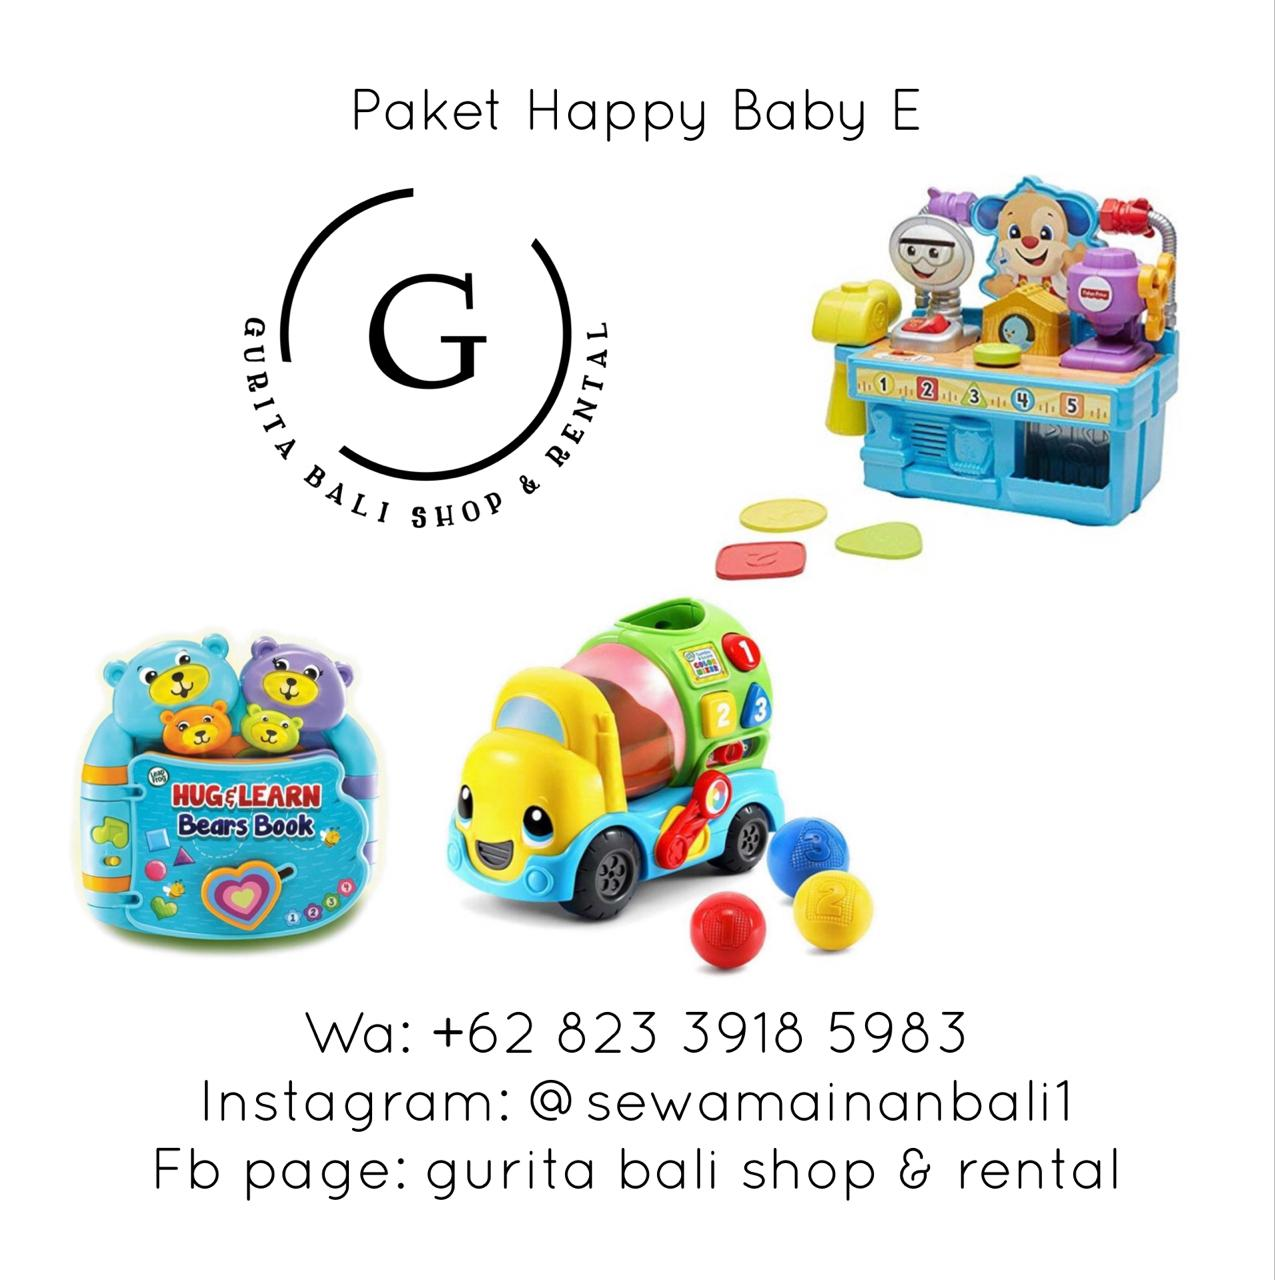 PAKET HAPPY BABY E